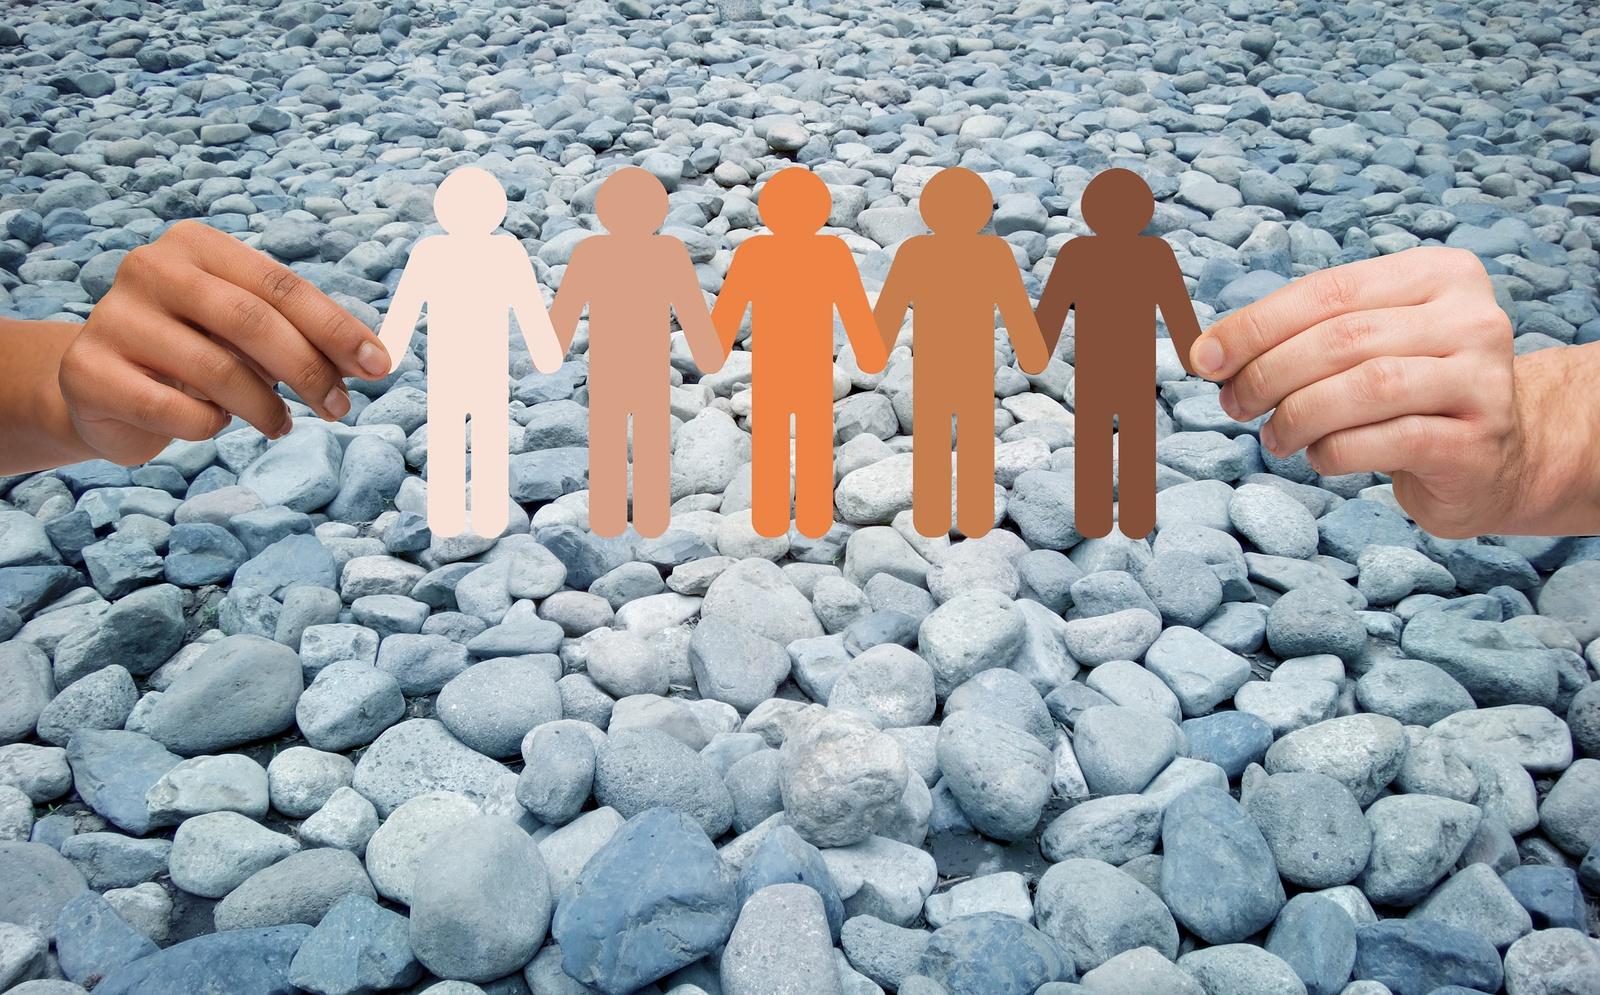 bigstock-immigration-unity-population-103873055.jpg